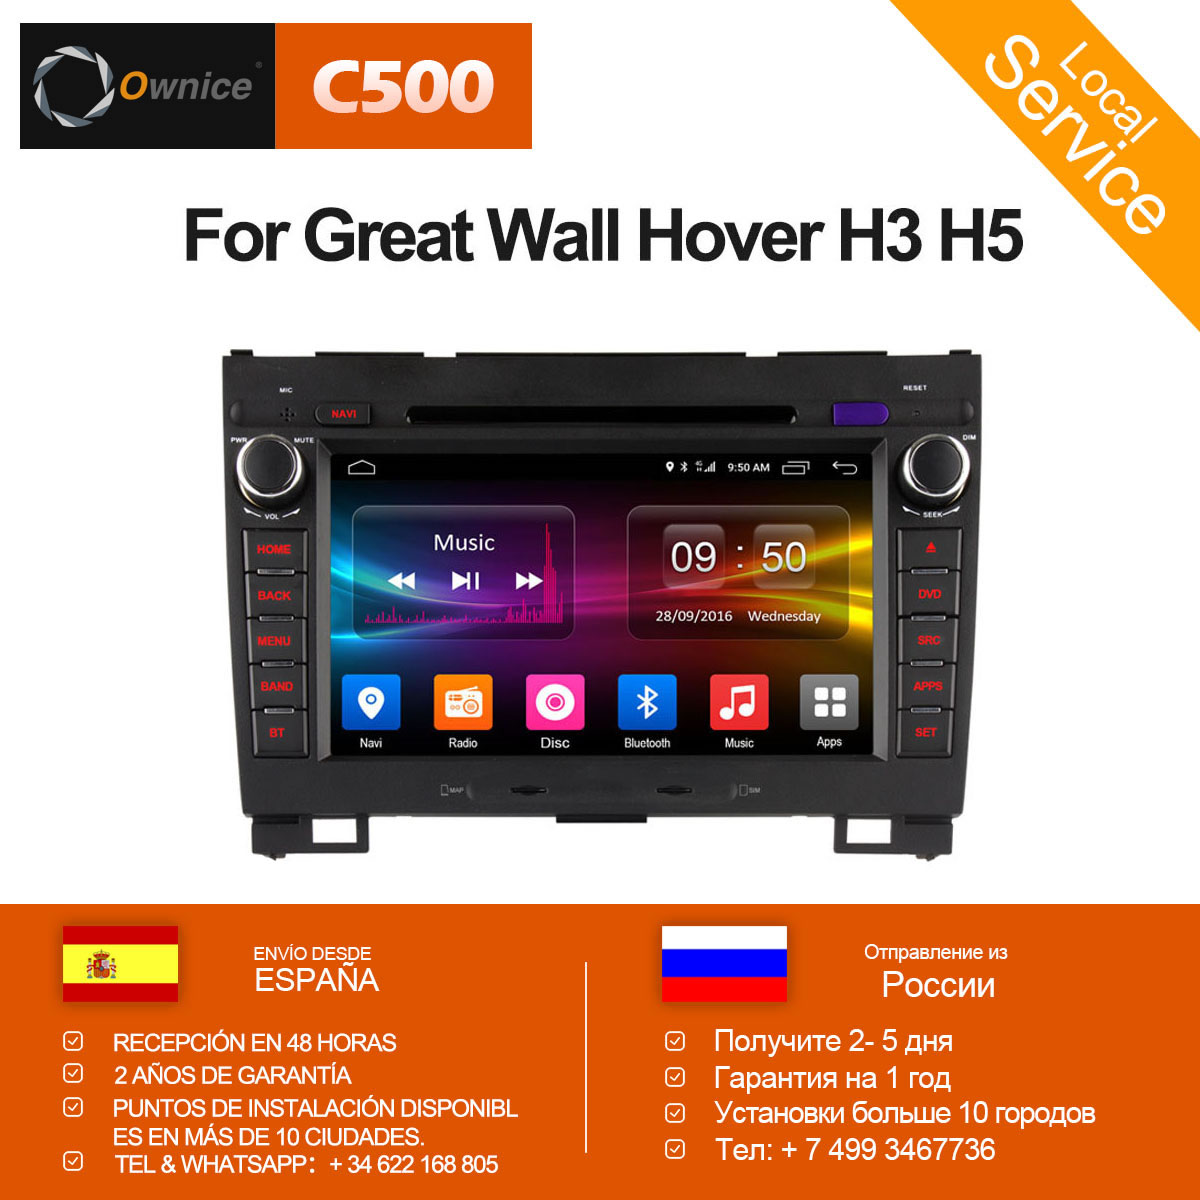 Ownice C500 4G SIM LTE Android 6,0 4 ядра dvd-плеер автомобиля Для Greatwall Haval парение H5 H3 gps navi Радио WI-FI 2 ГБ Оперативная память 32 ГБ